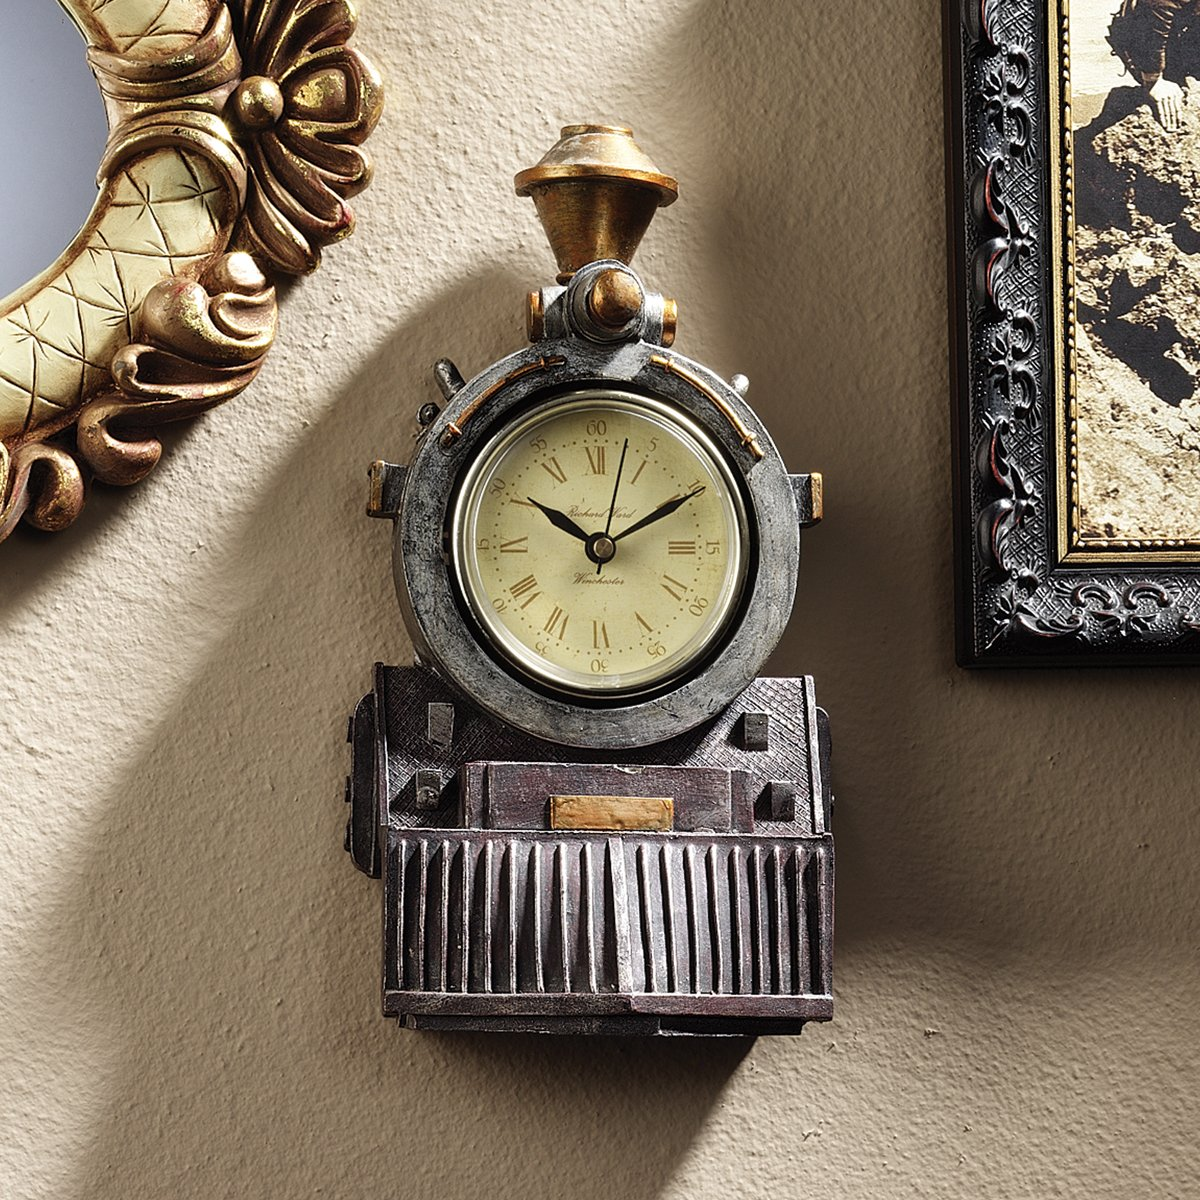 Design Toscano All Aboard Locomotive Train Steampunk Decor Wall Clock, 9 Inch, Polyresin, Full Color